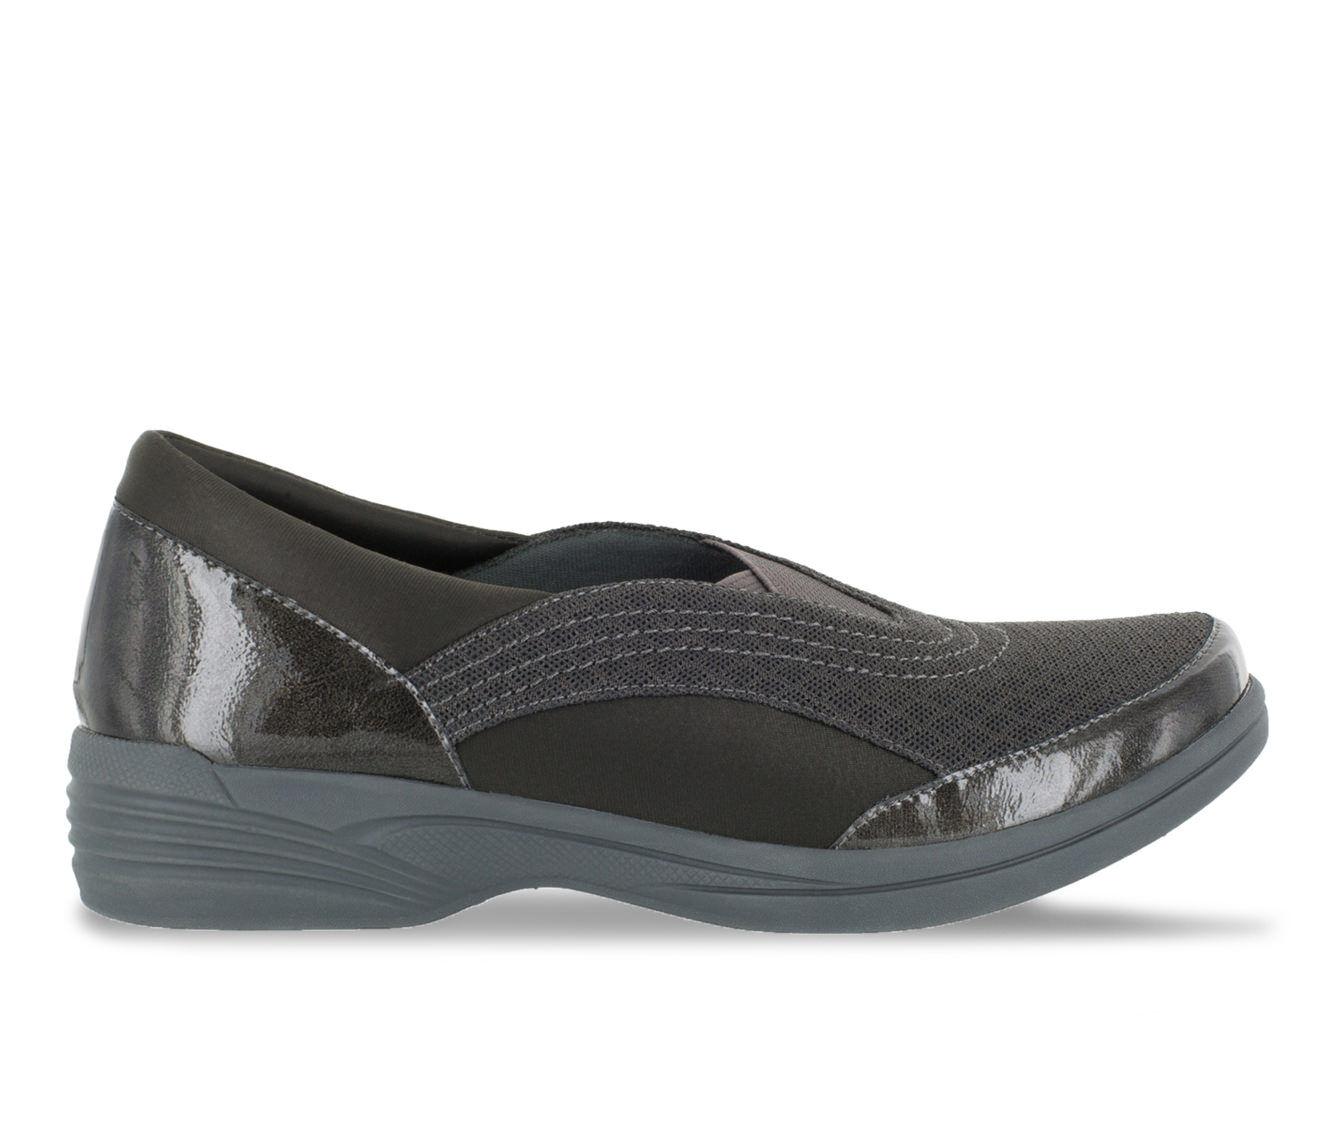 uk shoes_kd5712